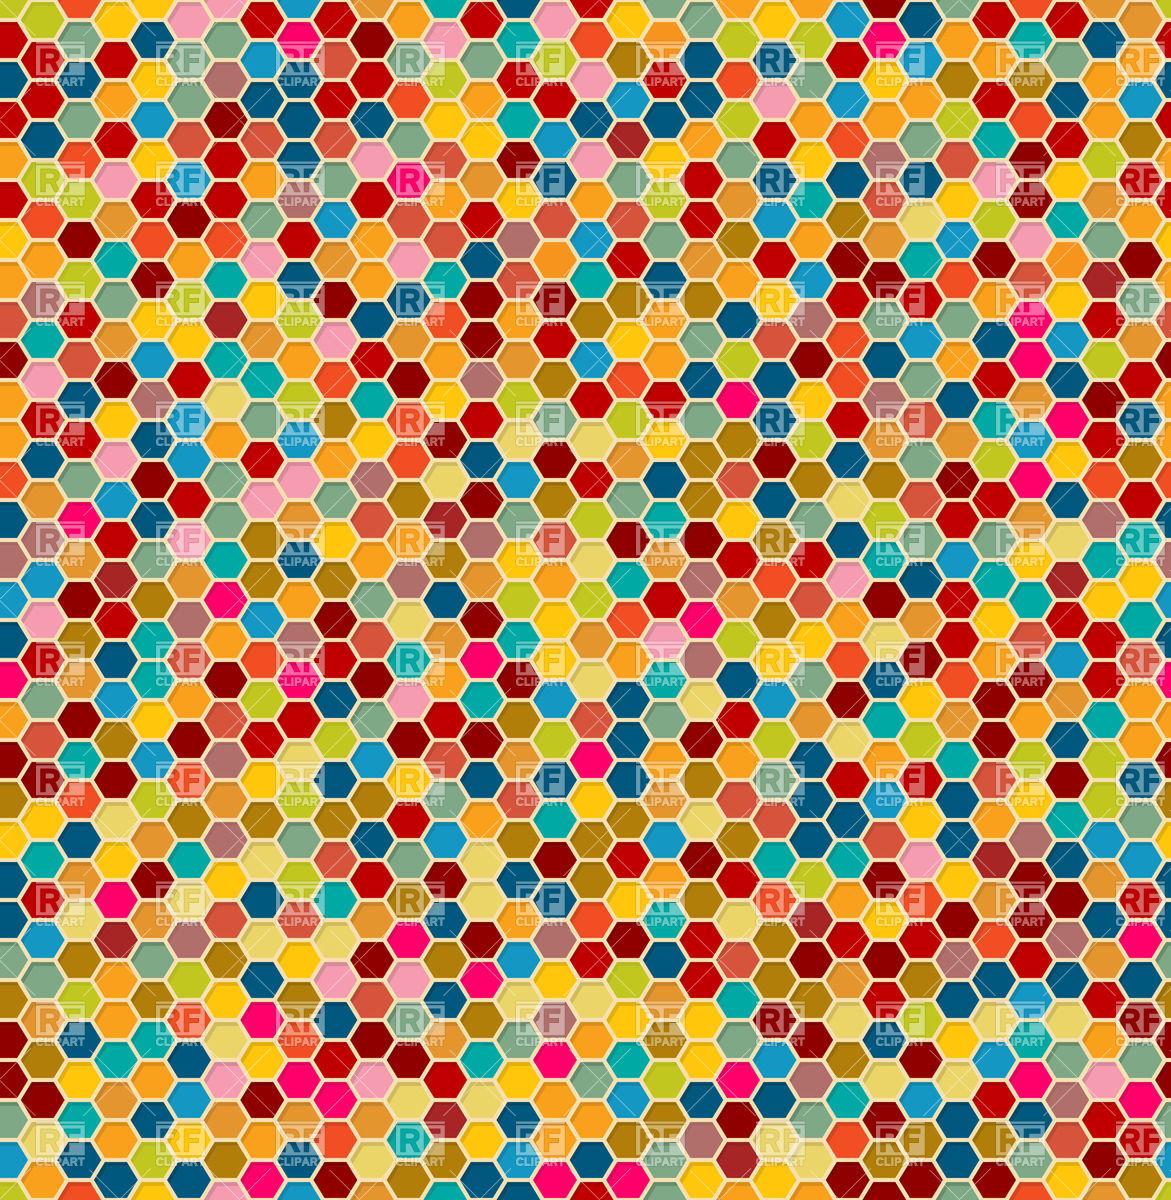 1171x1200 Mosaic Background Tiles